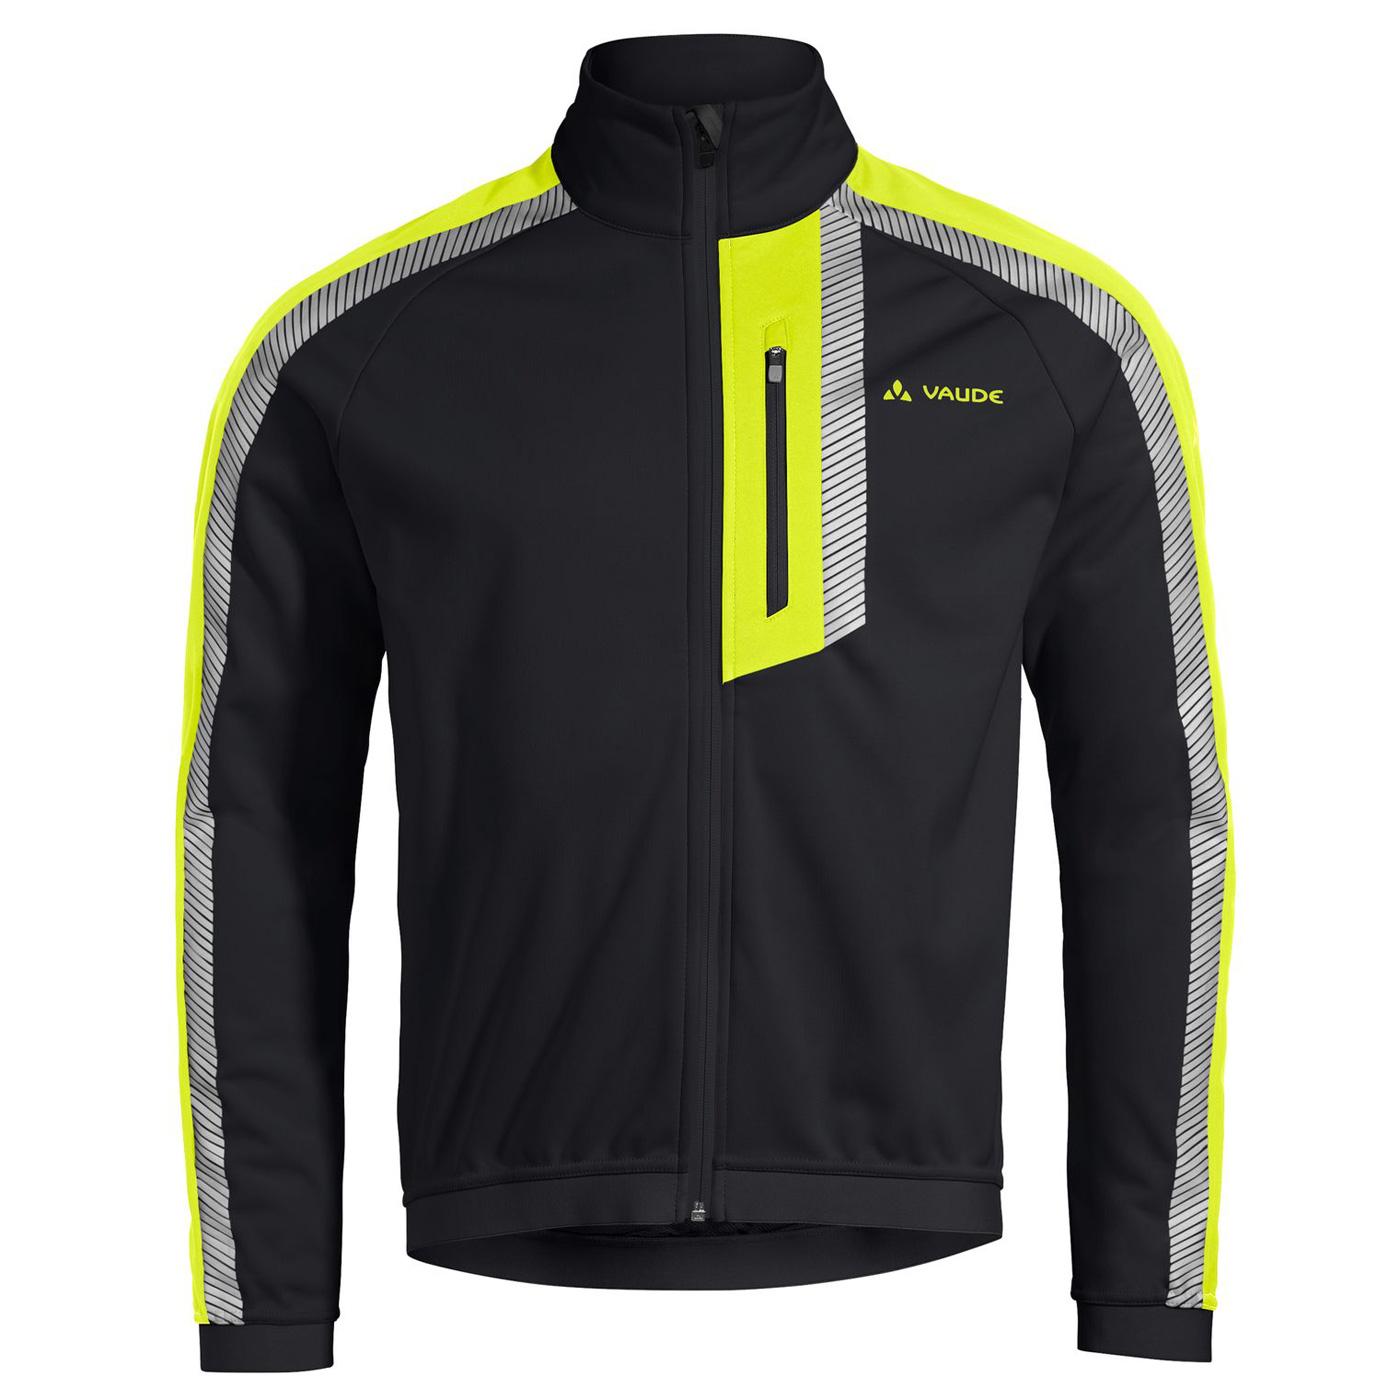 Vaude Men's Luminum Softshell Jacket II - black/yellow